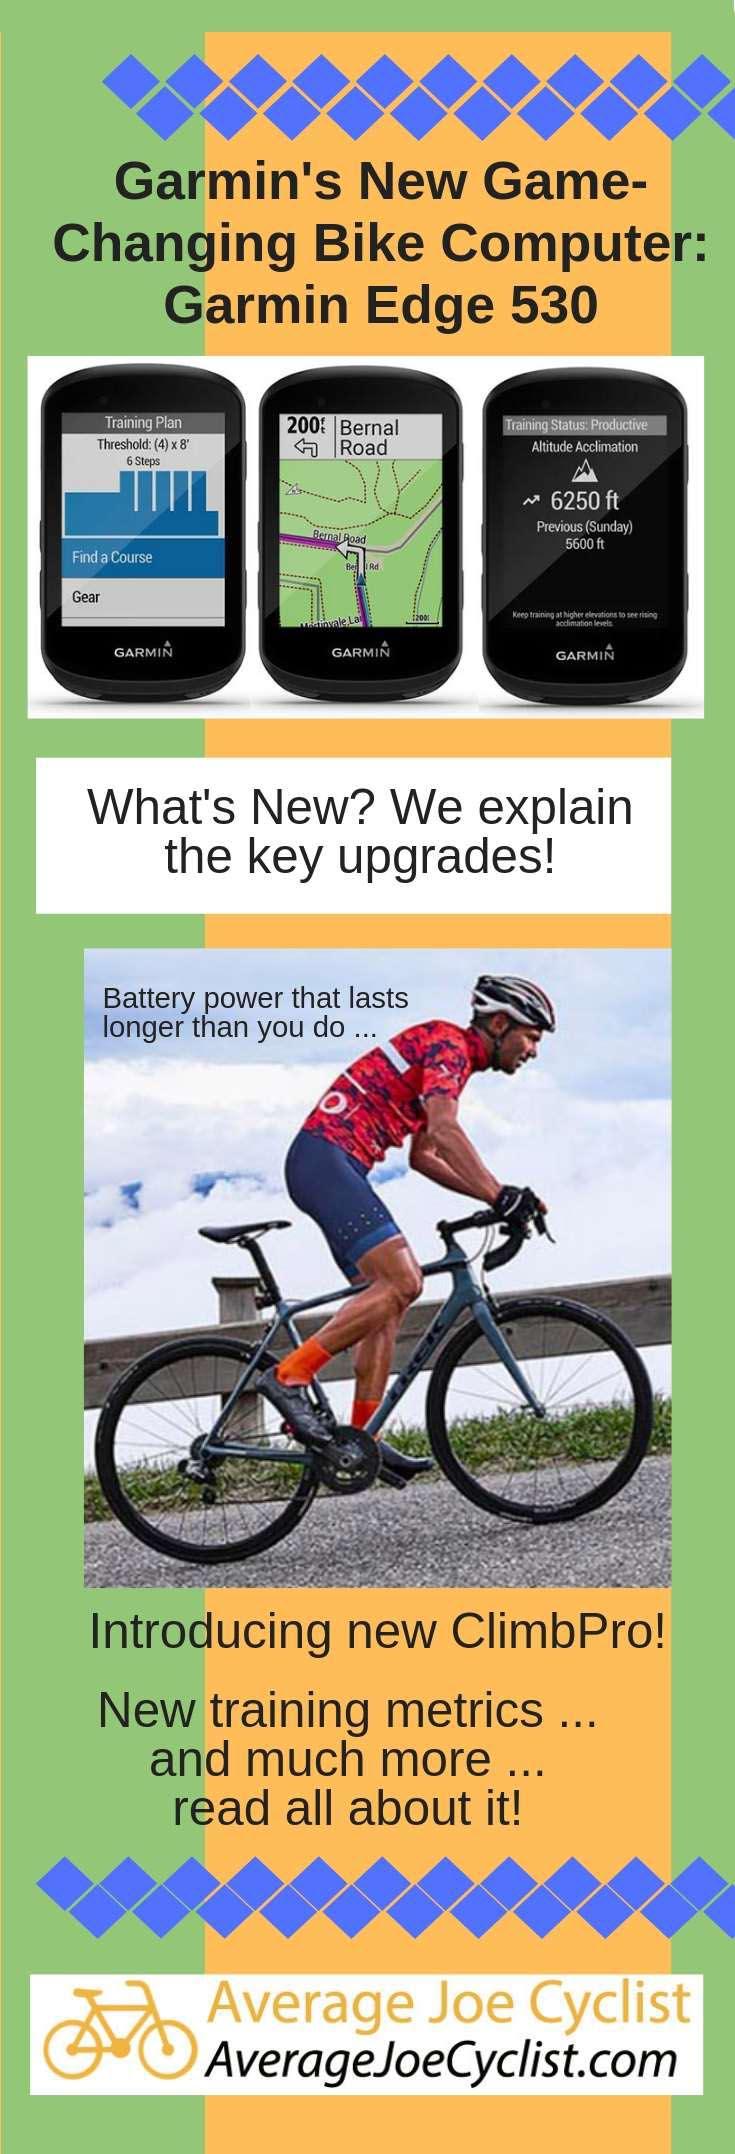 9 Great Upgrades In The New Garmin Edge 530 Garmin S Game